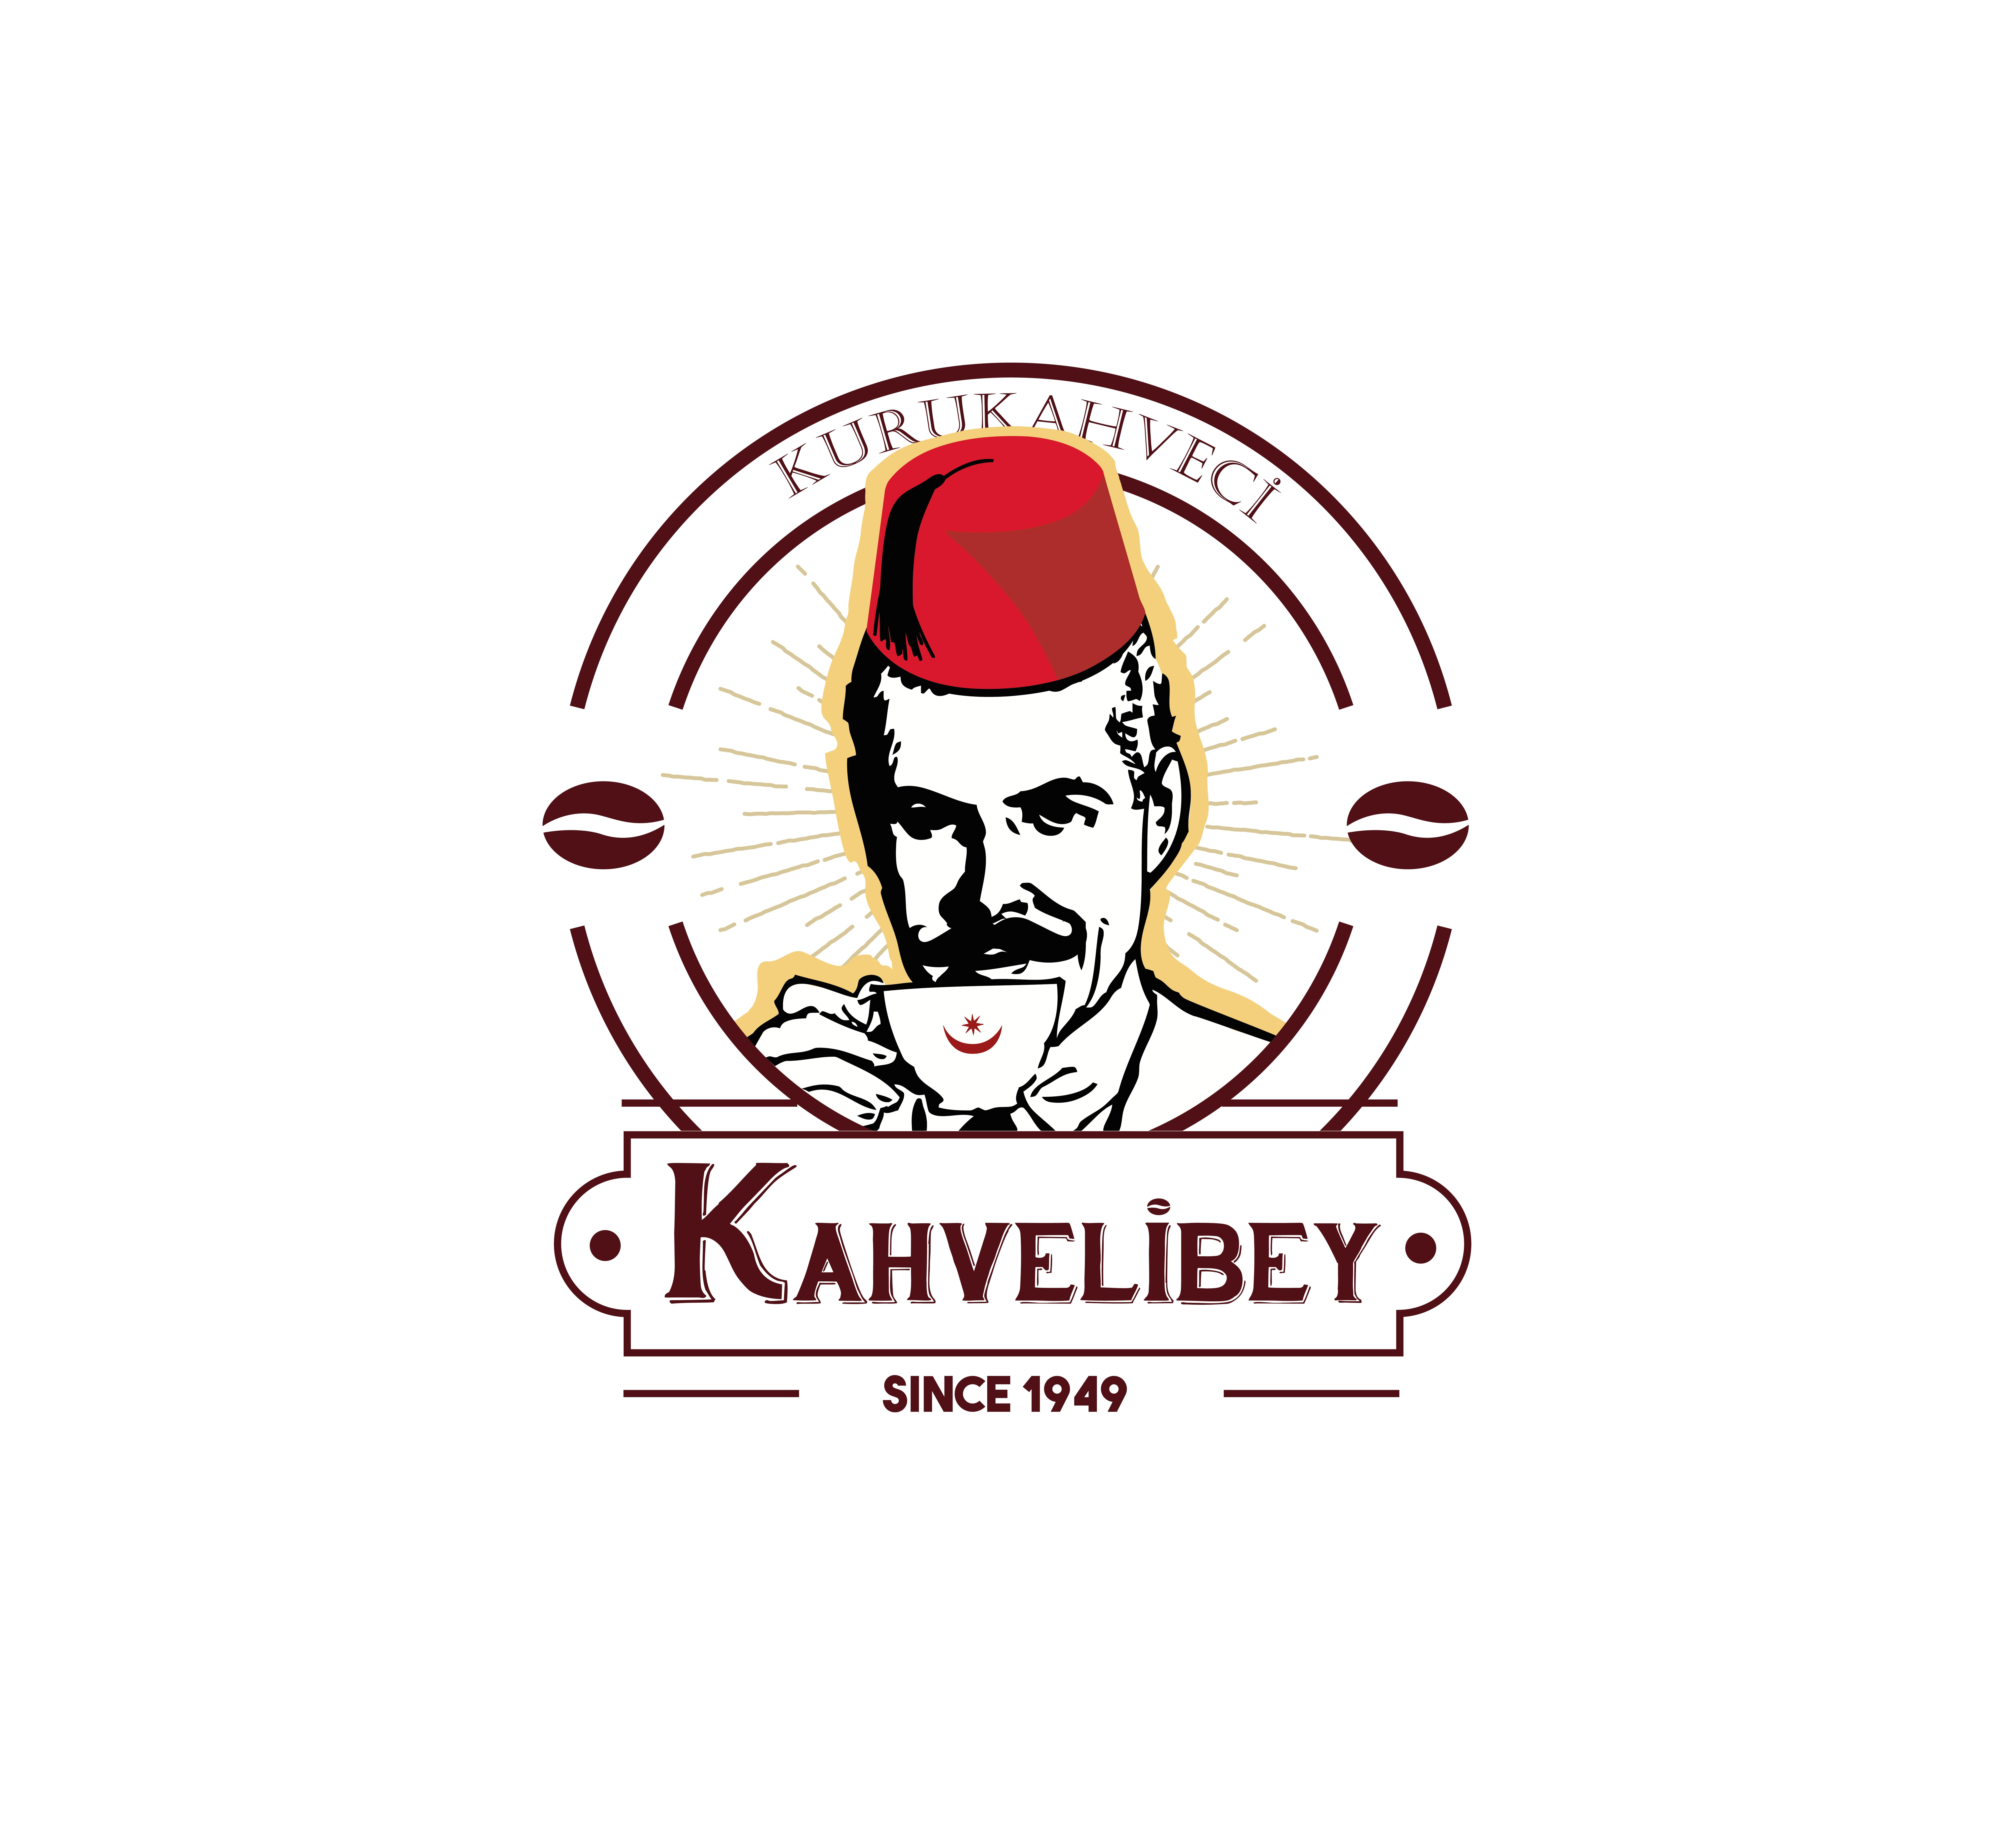 KAHVELİBEY